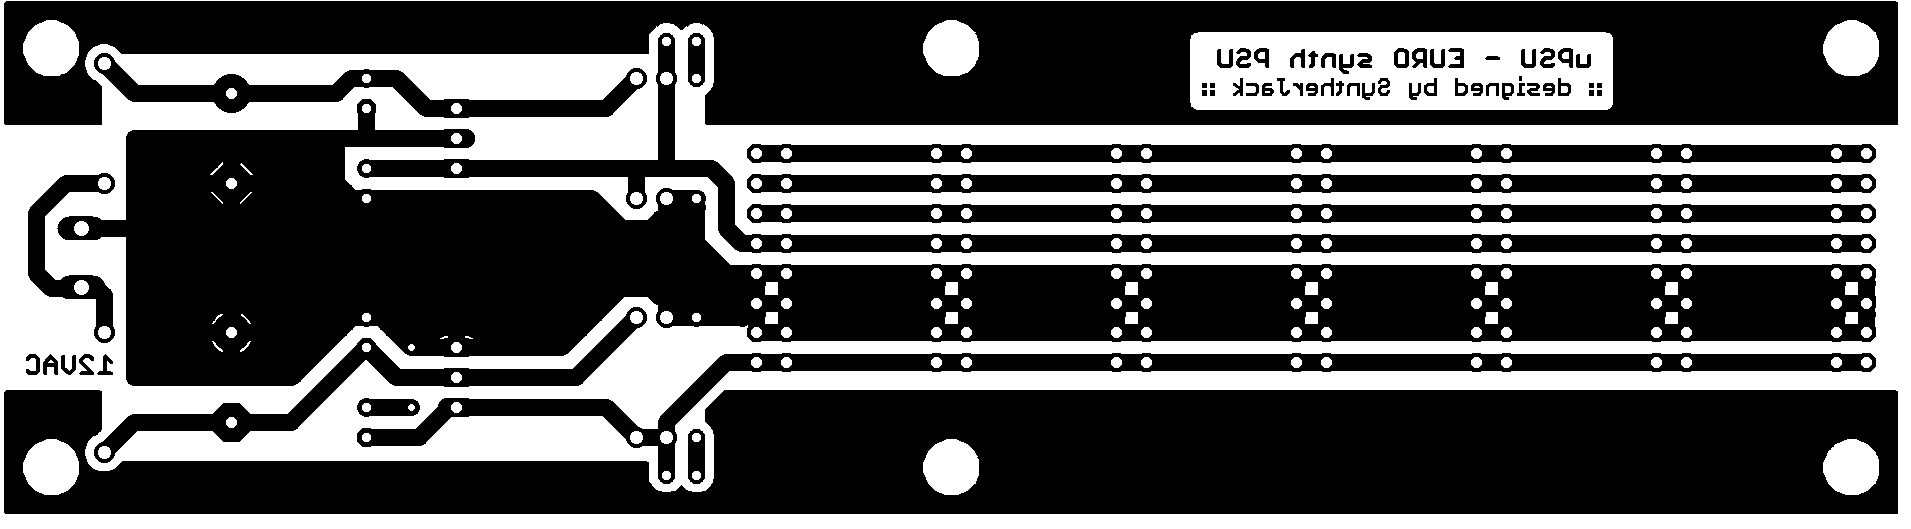 Mini PSU PCB BOTTOM layer